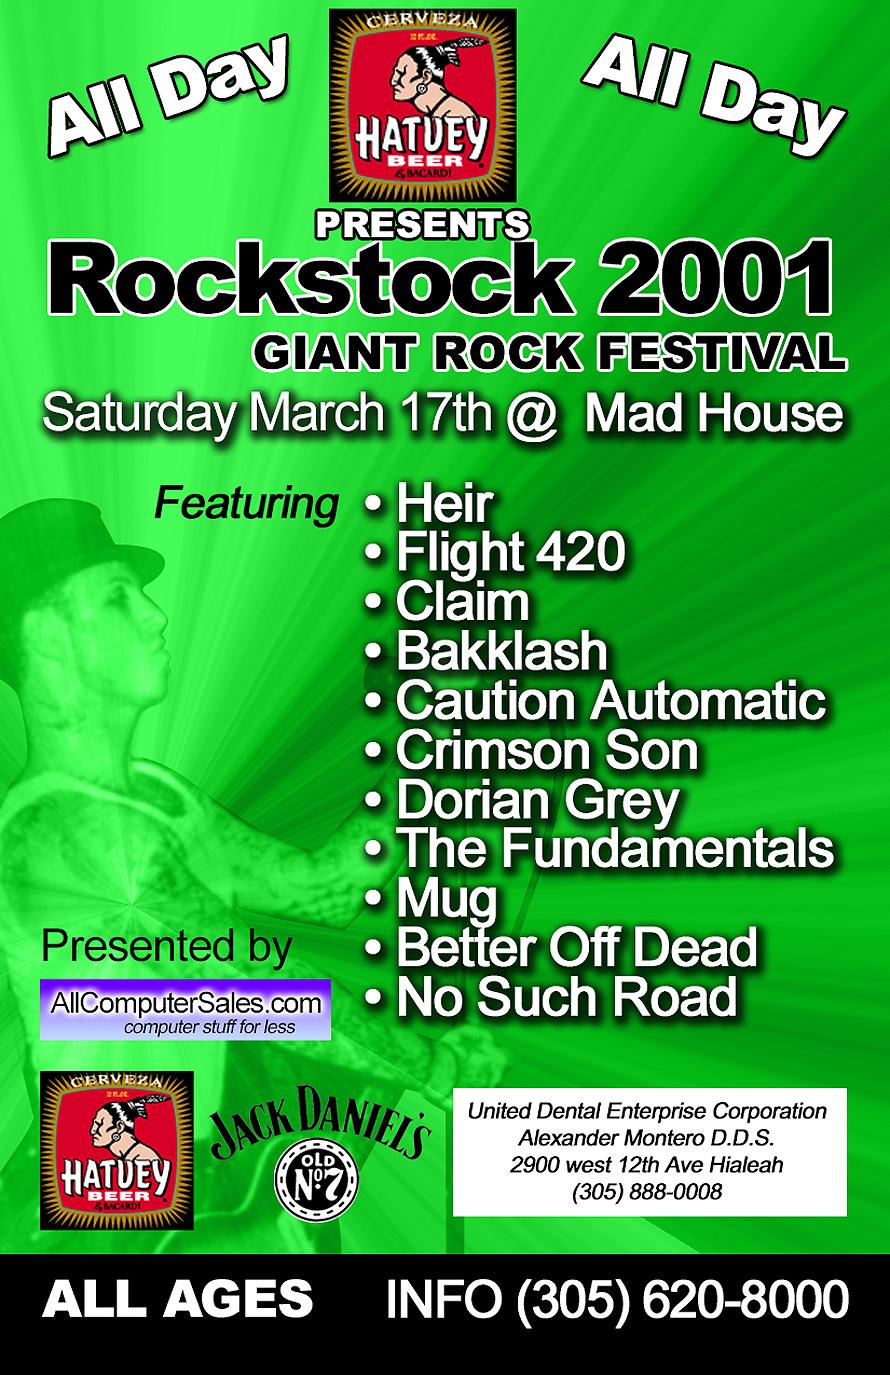 Rockstock 2001 Springbreak & St. Patricks Day at Mad House